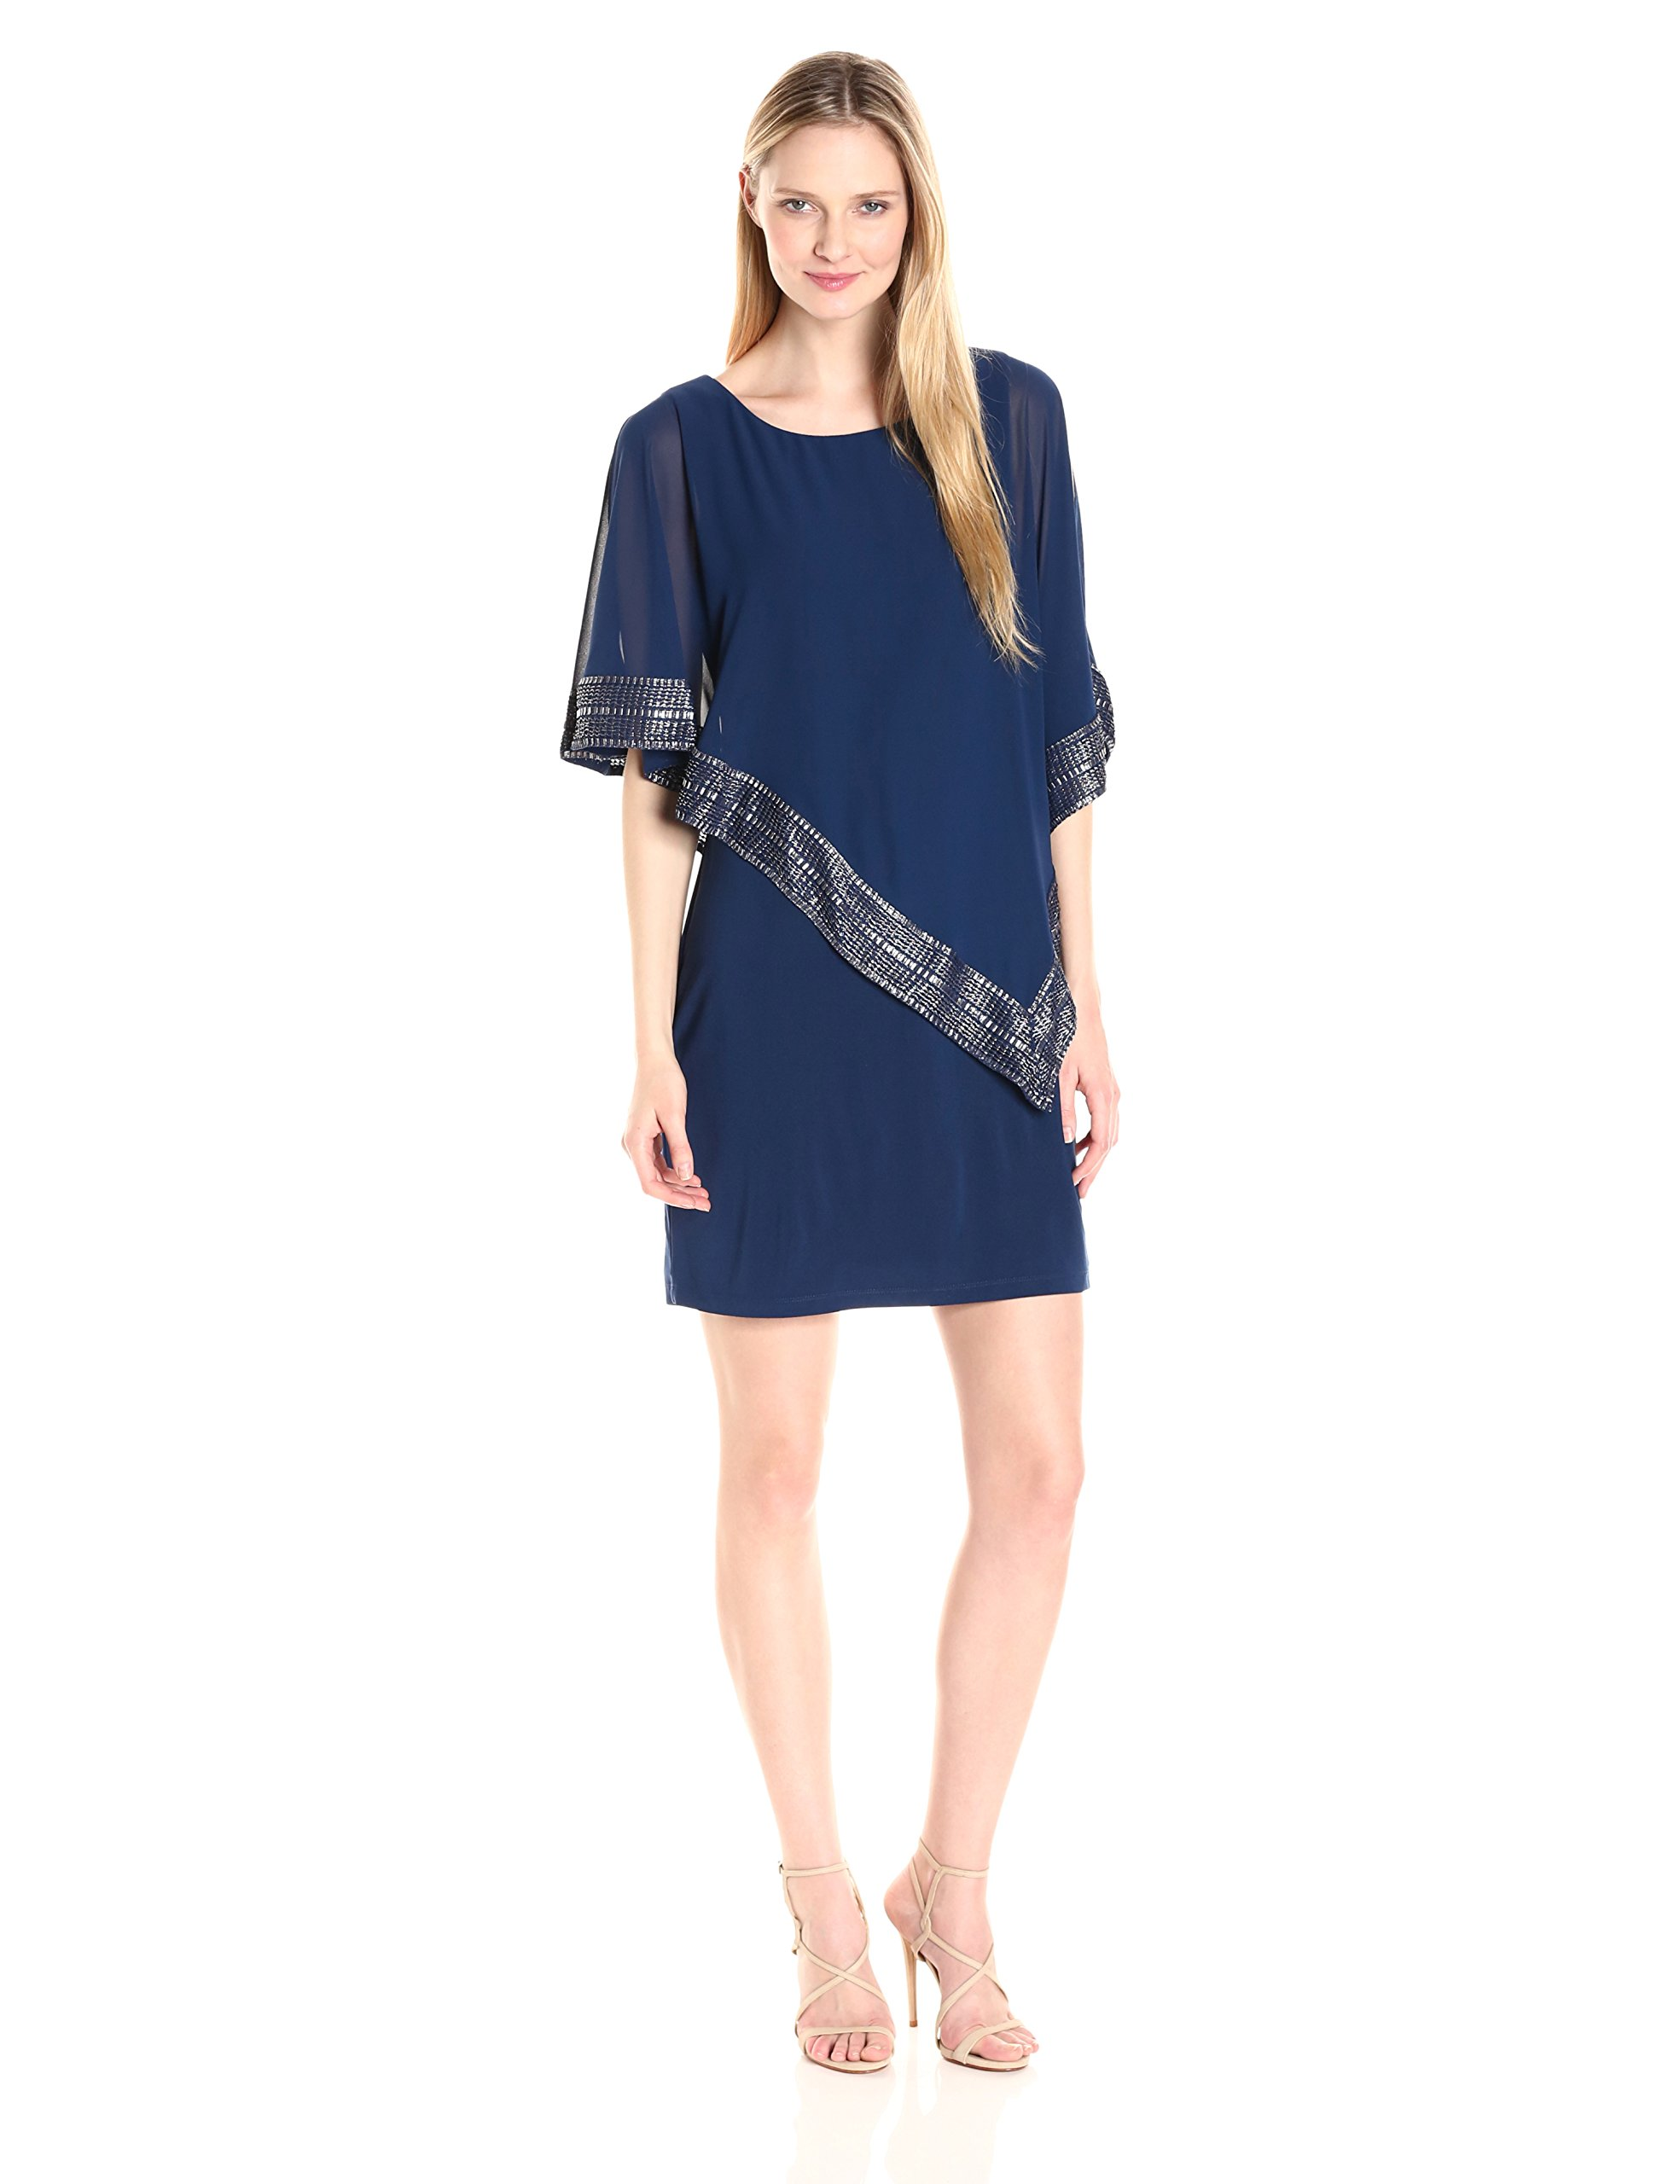 S.L. Fashions Women's Cape Dress, Navy/Silver, 16